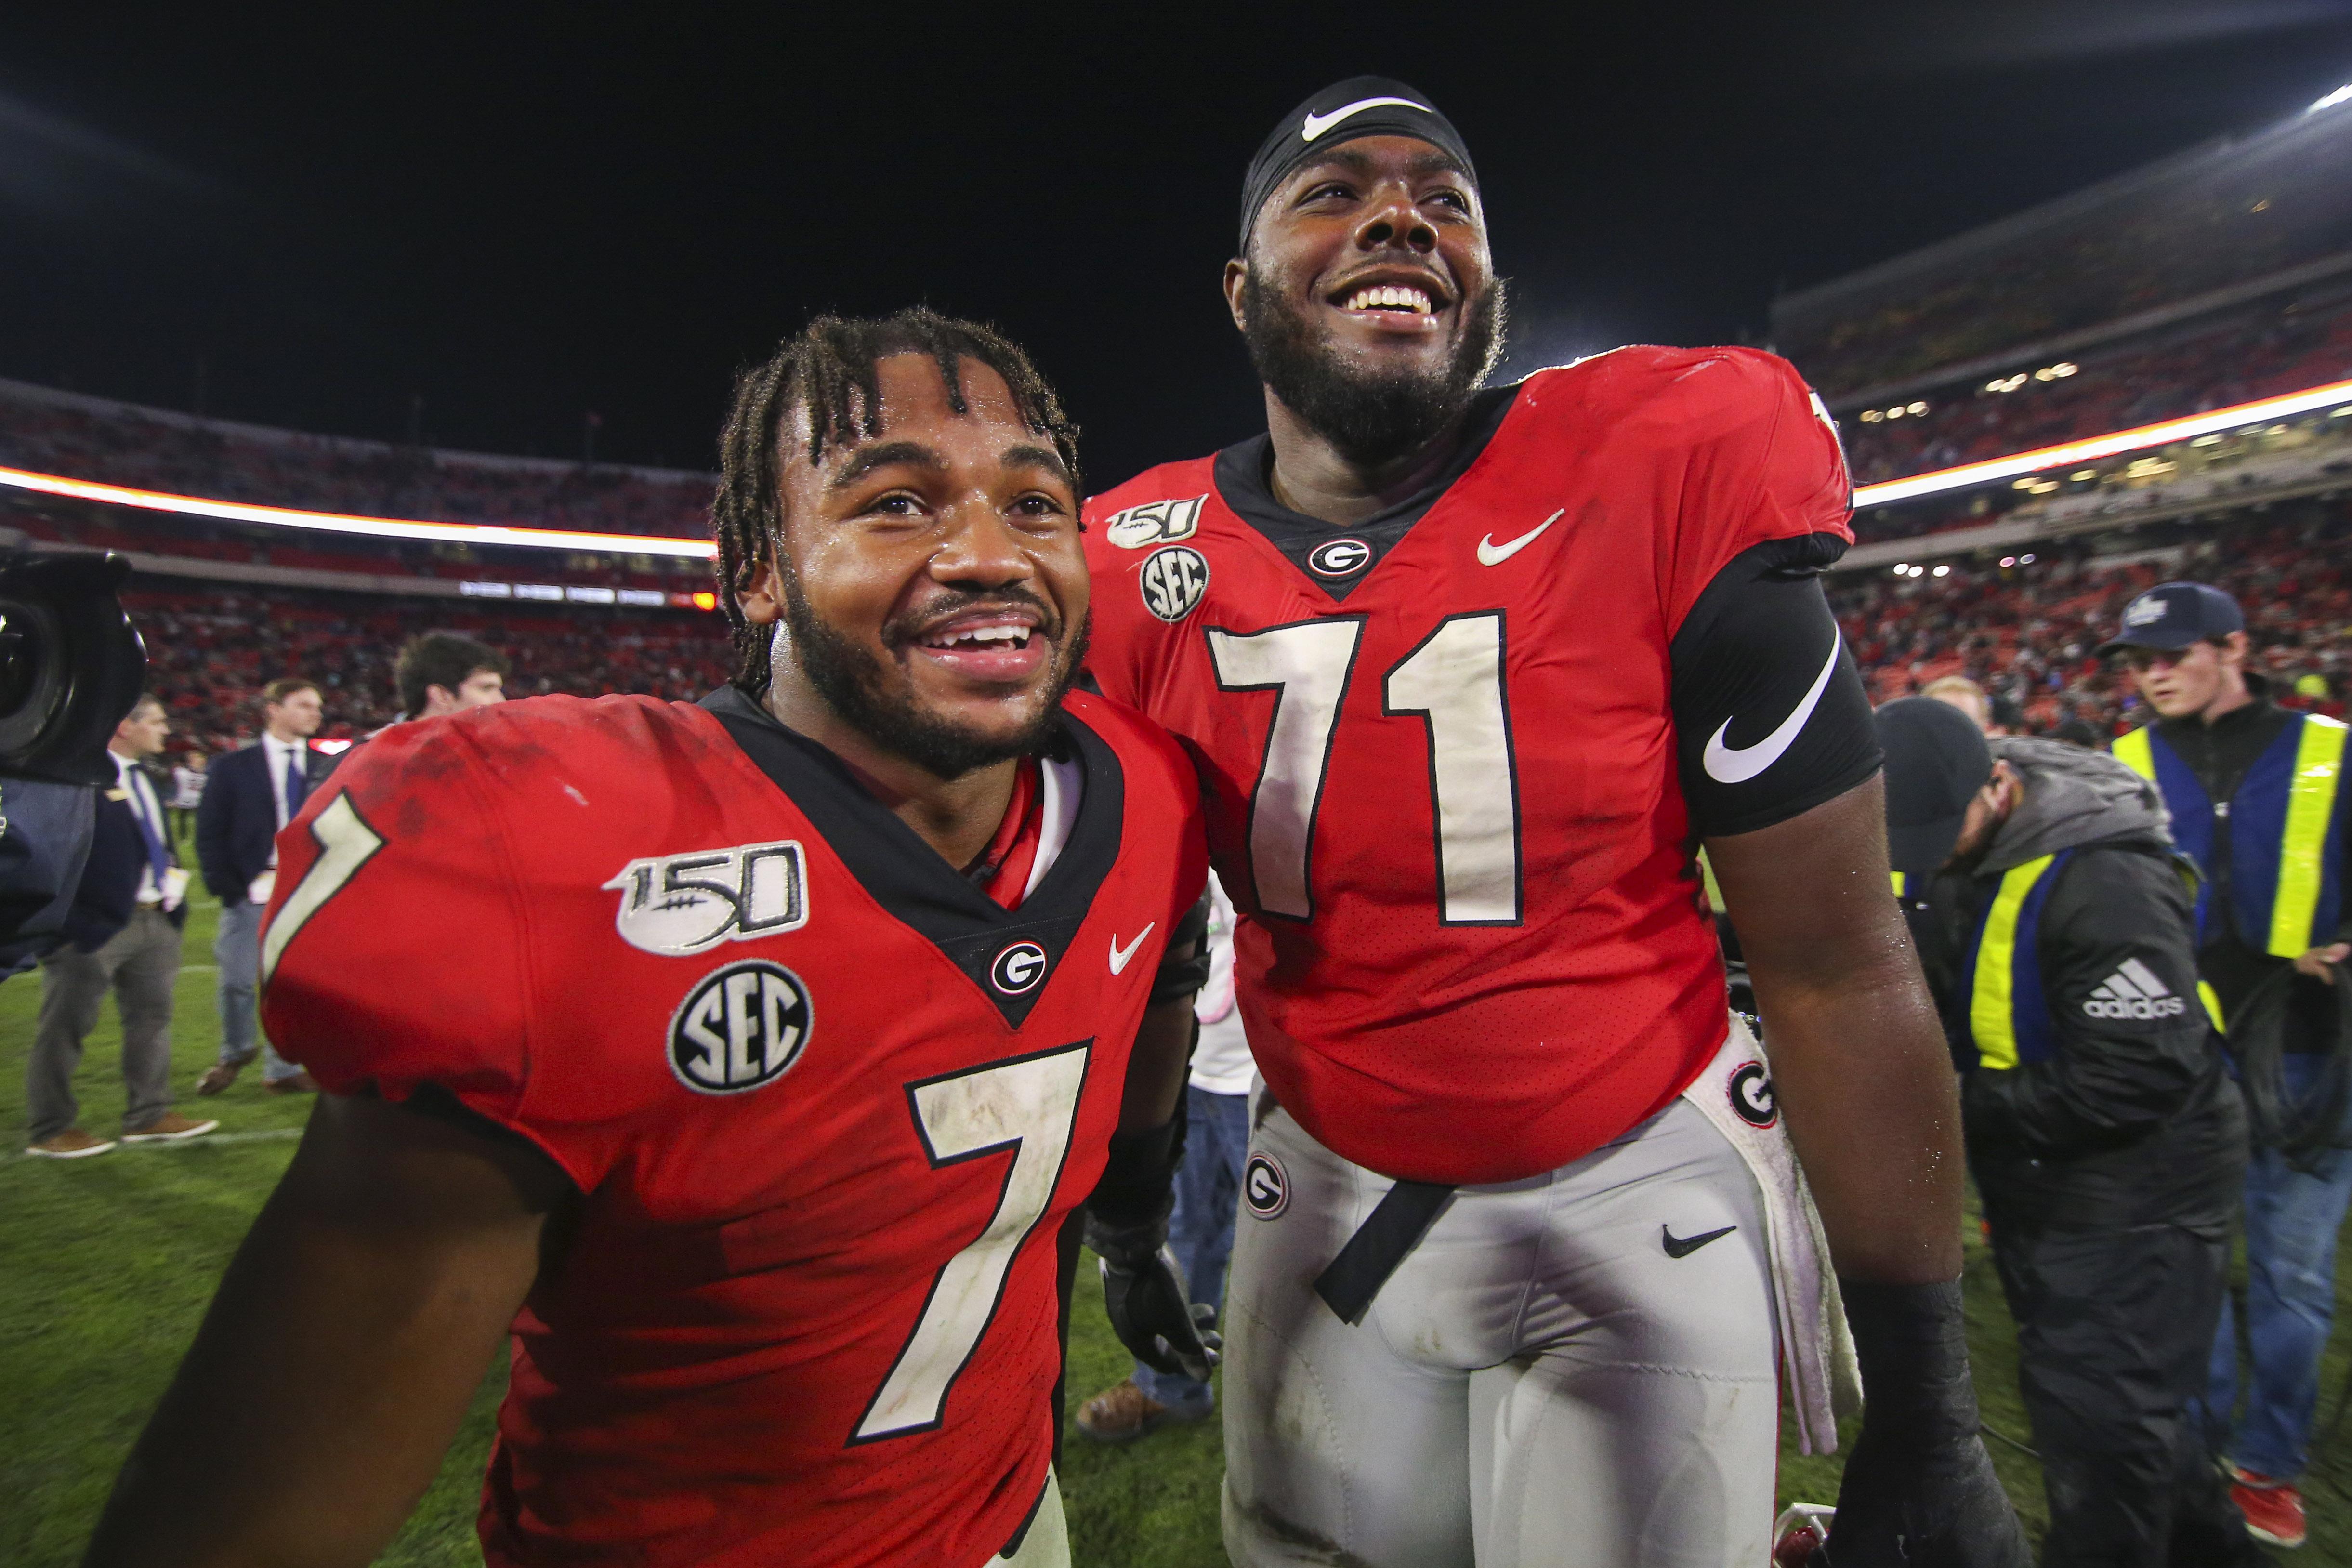 Georgia Football: Three Bulldogs in Todd McShay's Two Round NFL Mock Draft